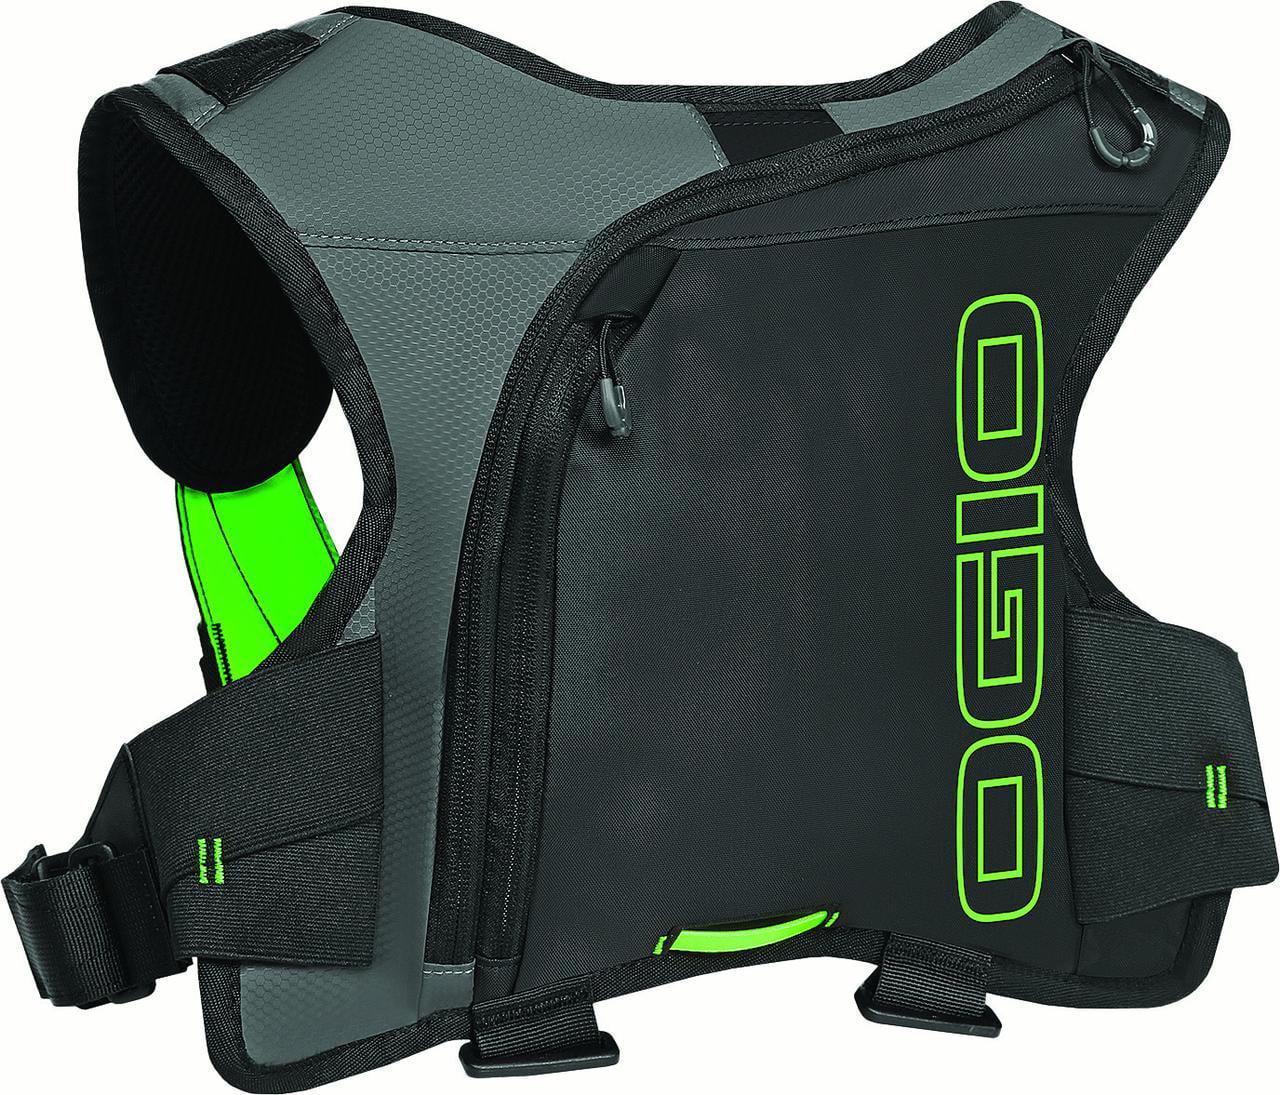 OGIO 122104.03 Ezrberg 1L Hydration Pack Black Hi-Vis Green by Ogio